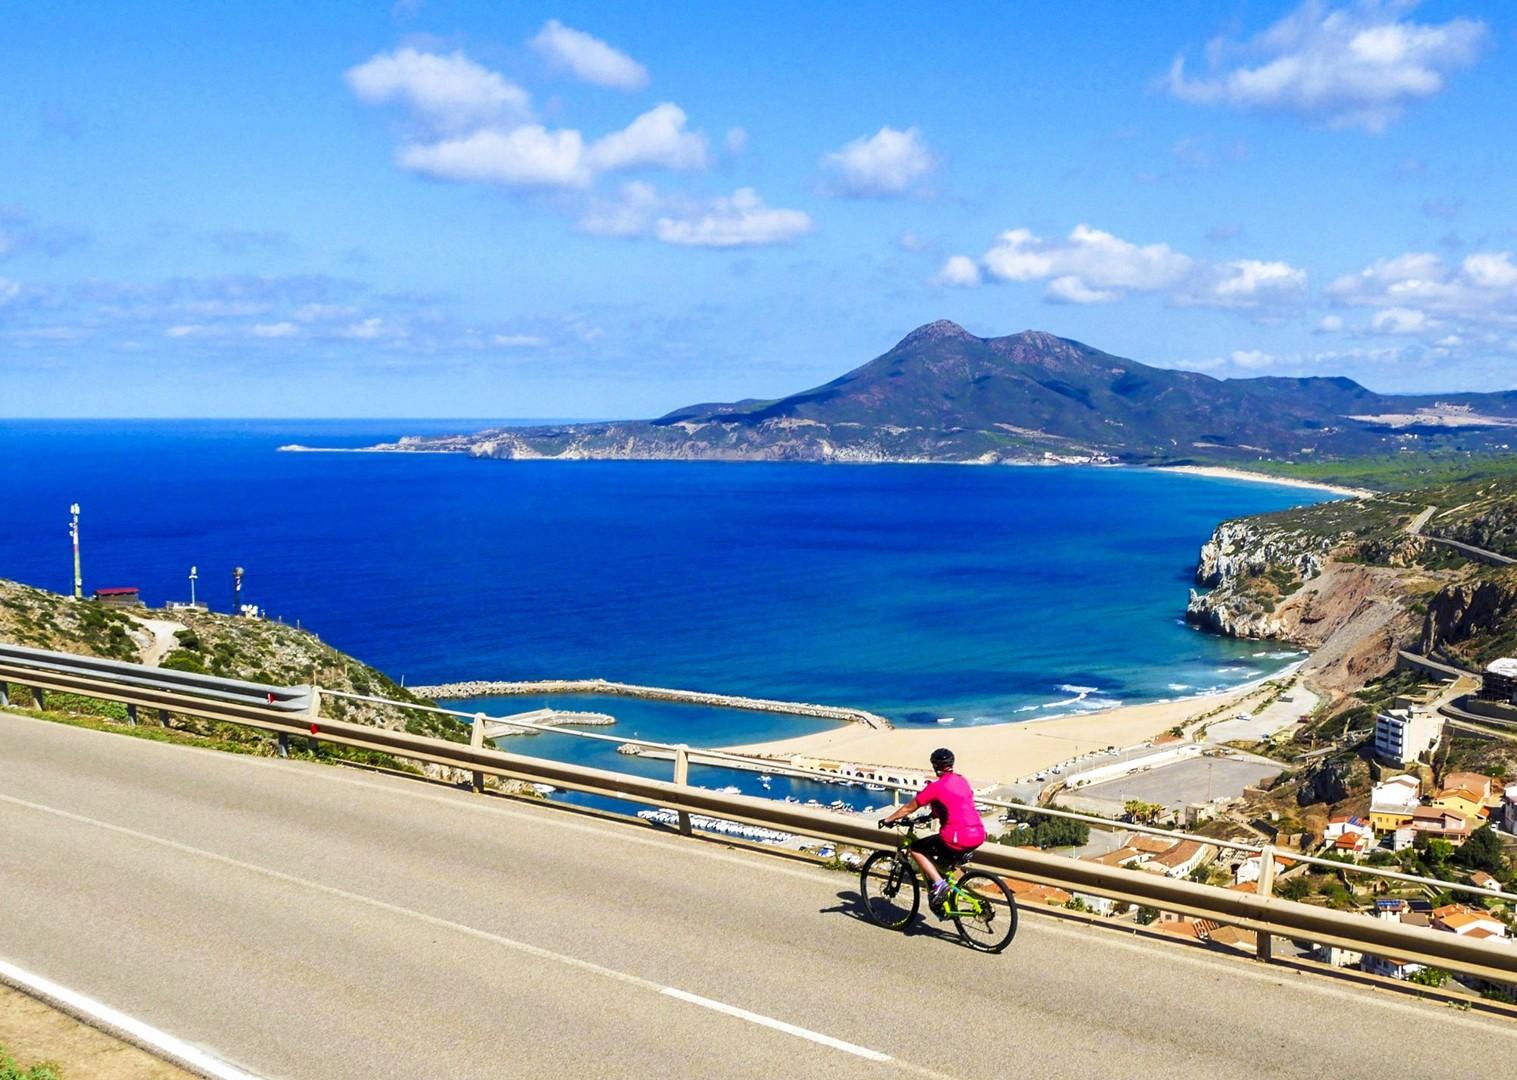 cycling-in-italy-leisure-scenery-sardinian-sea.jpg - Italy - Sardinia - Island Flavours - Guided Leisure Cycling Holiday - Italia Leisure and Family Cycling